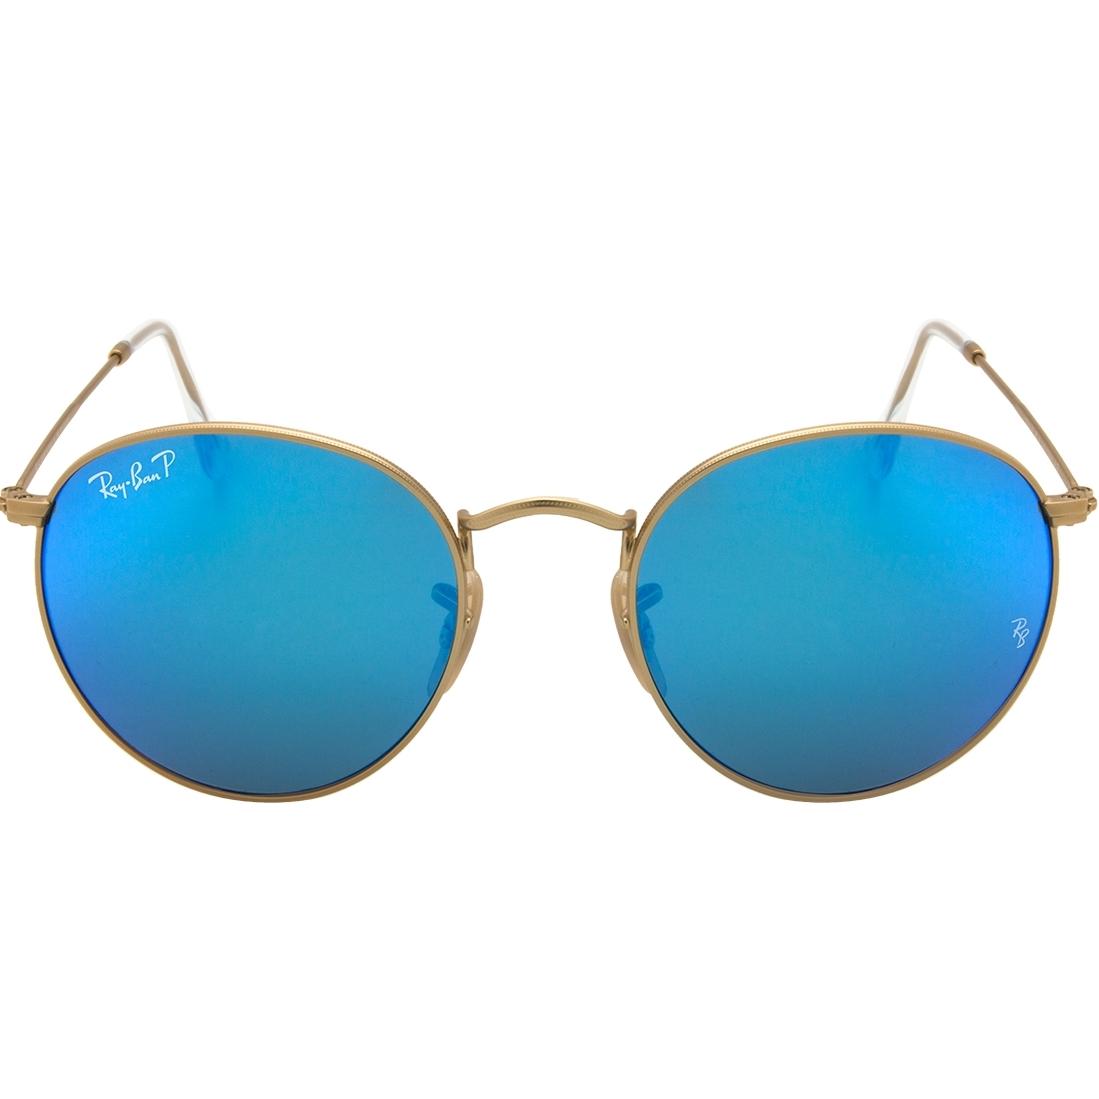 oiOferta   Moda e Acessórios   Óculos de Sol   Óculos Unissex. Óculos Ray  Ban Round ... b9efe81e3b